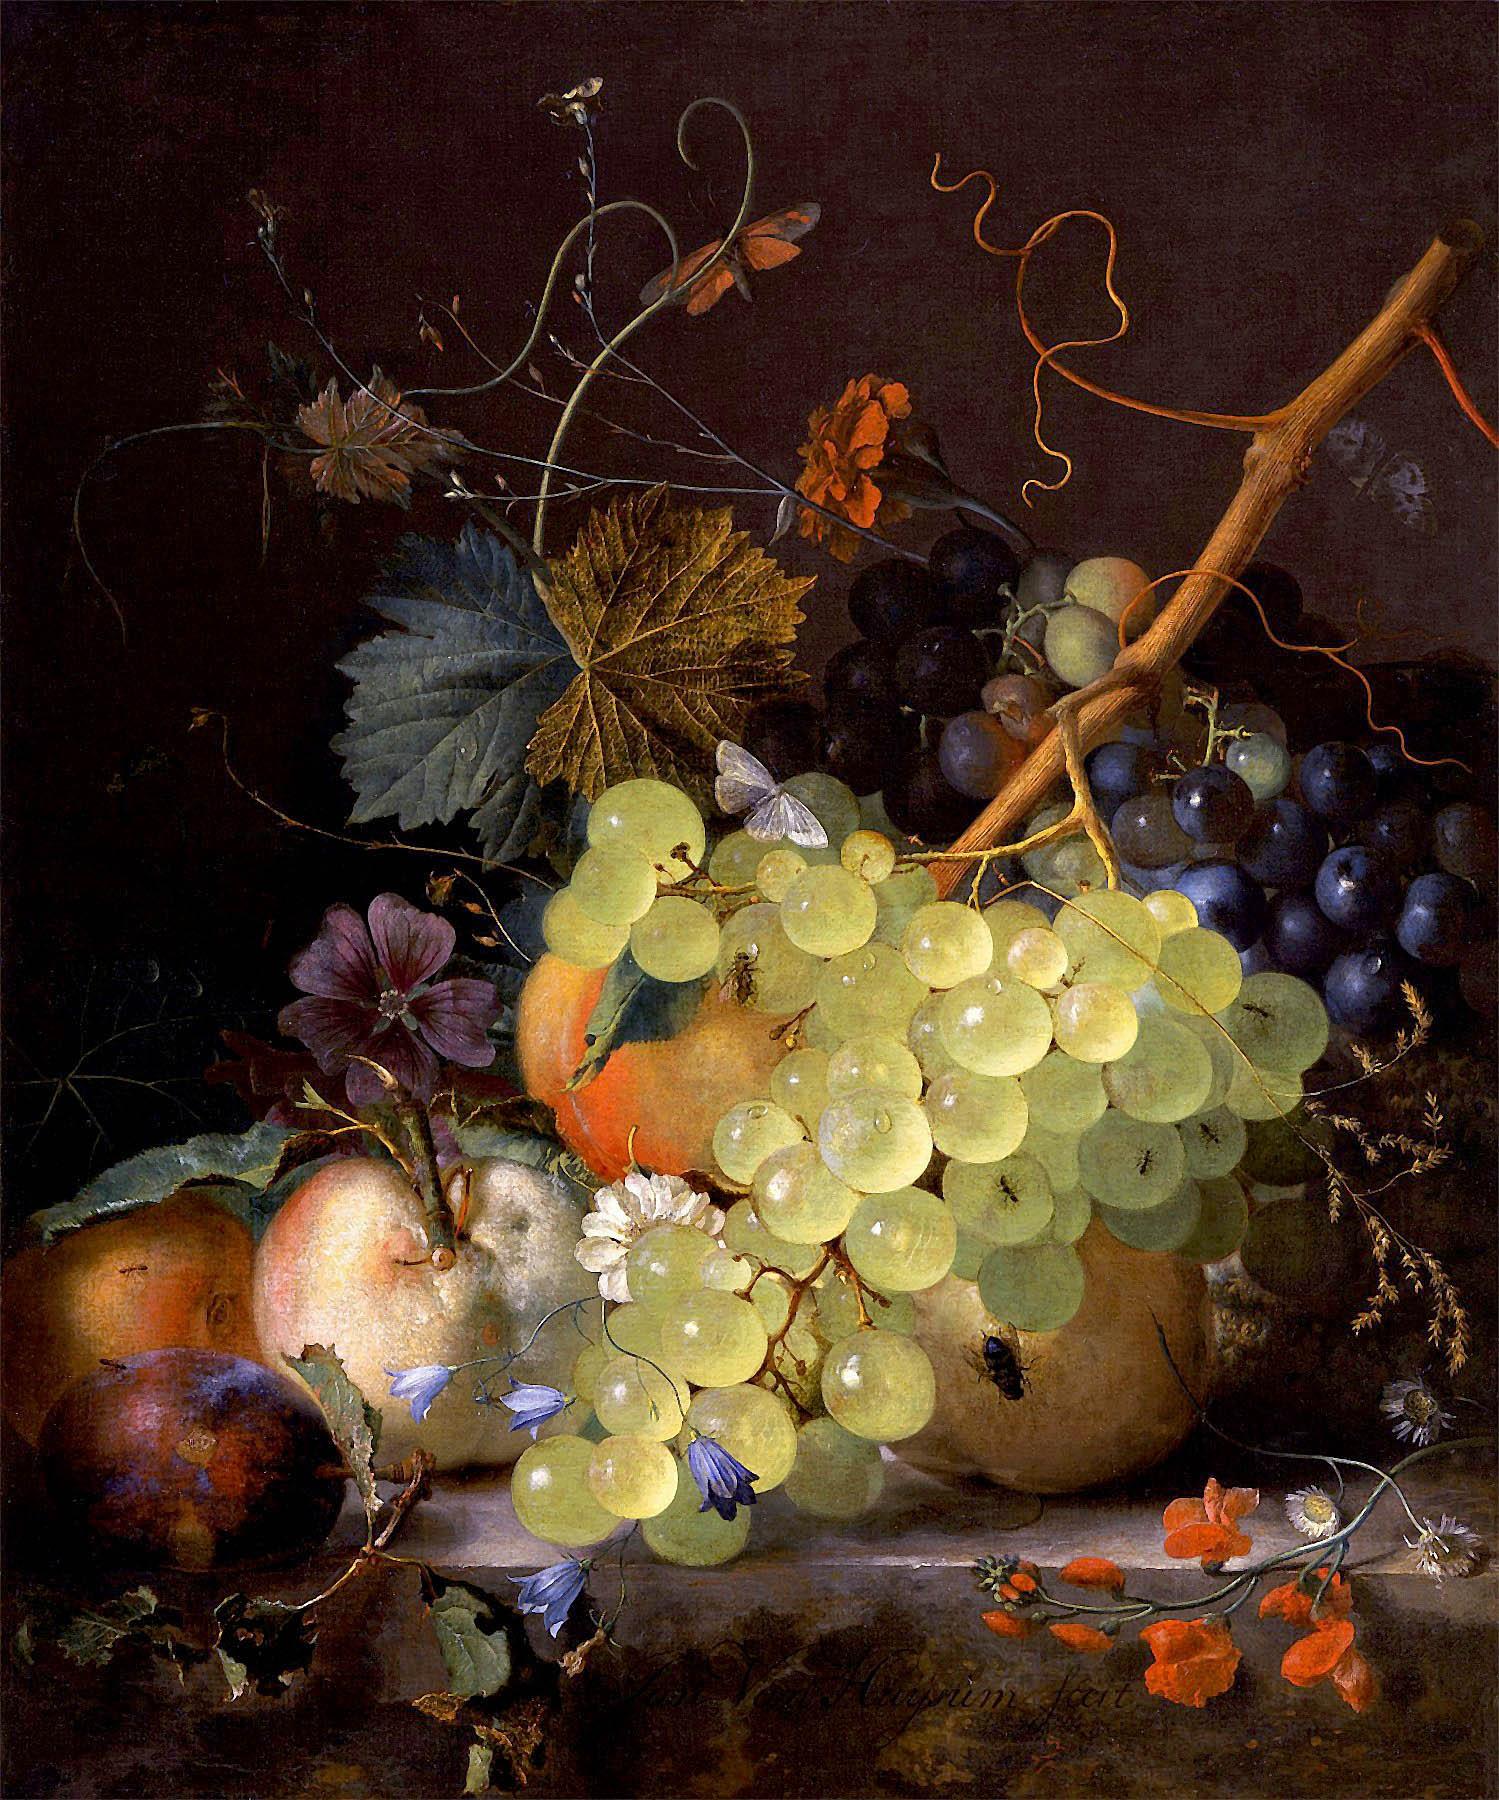 Jan van Huysum